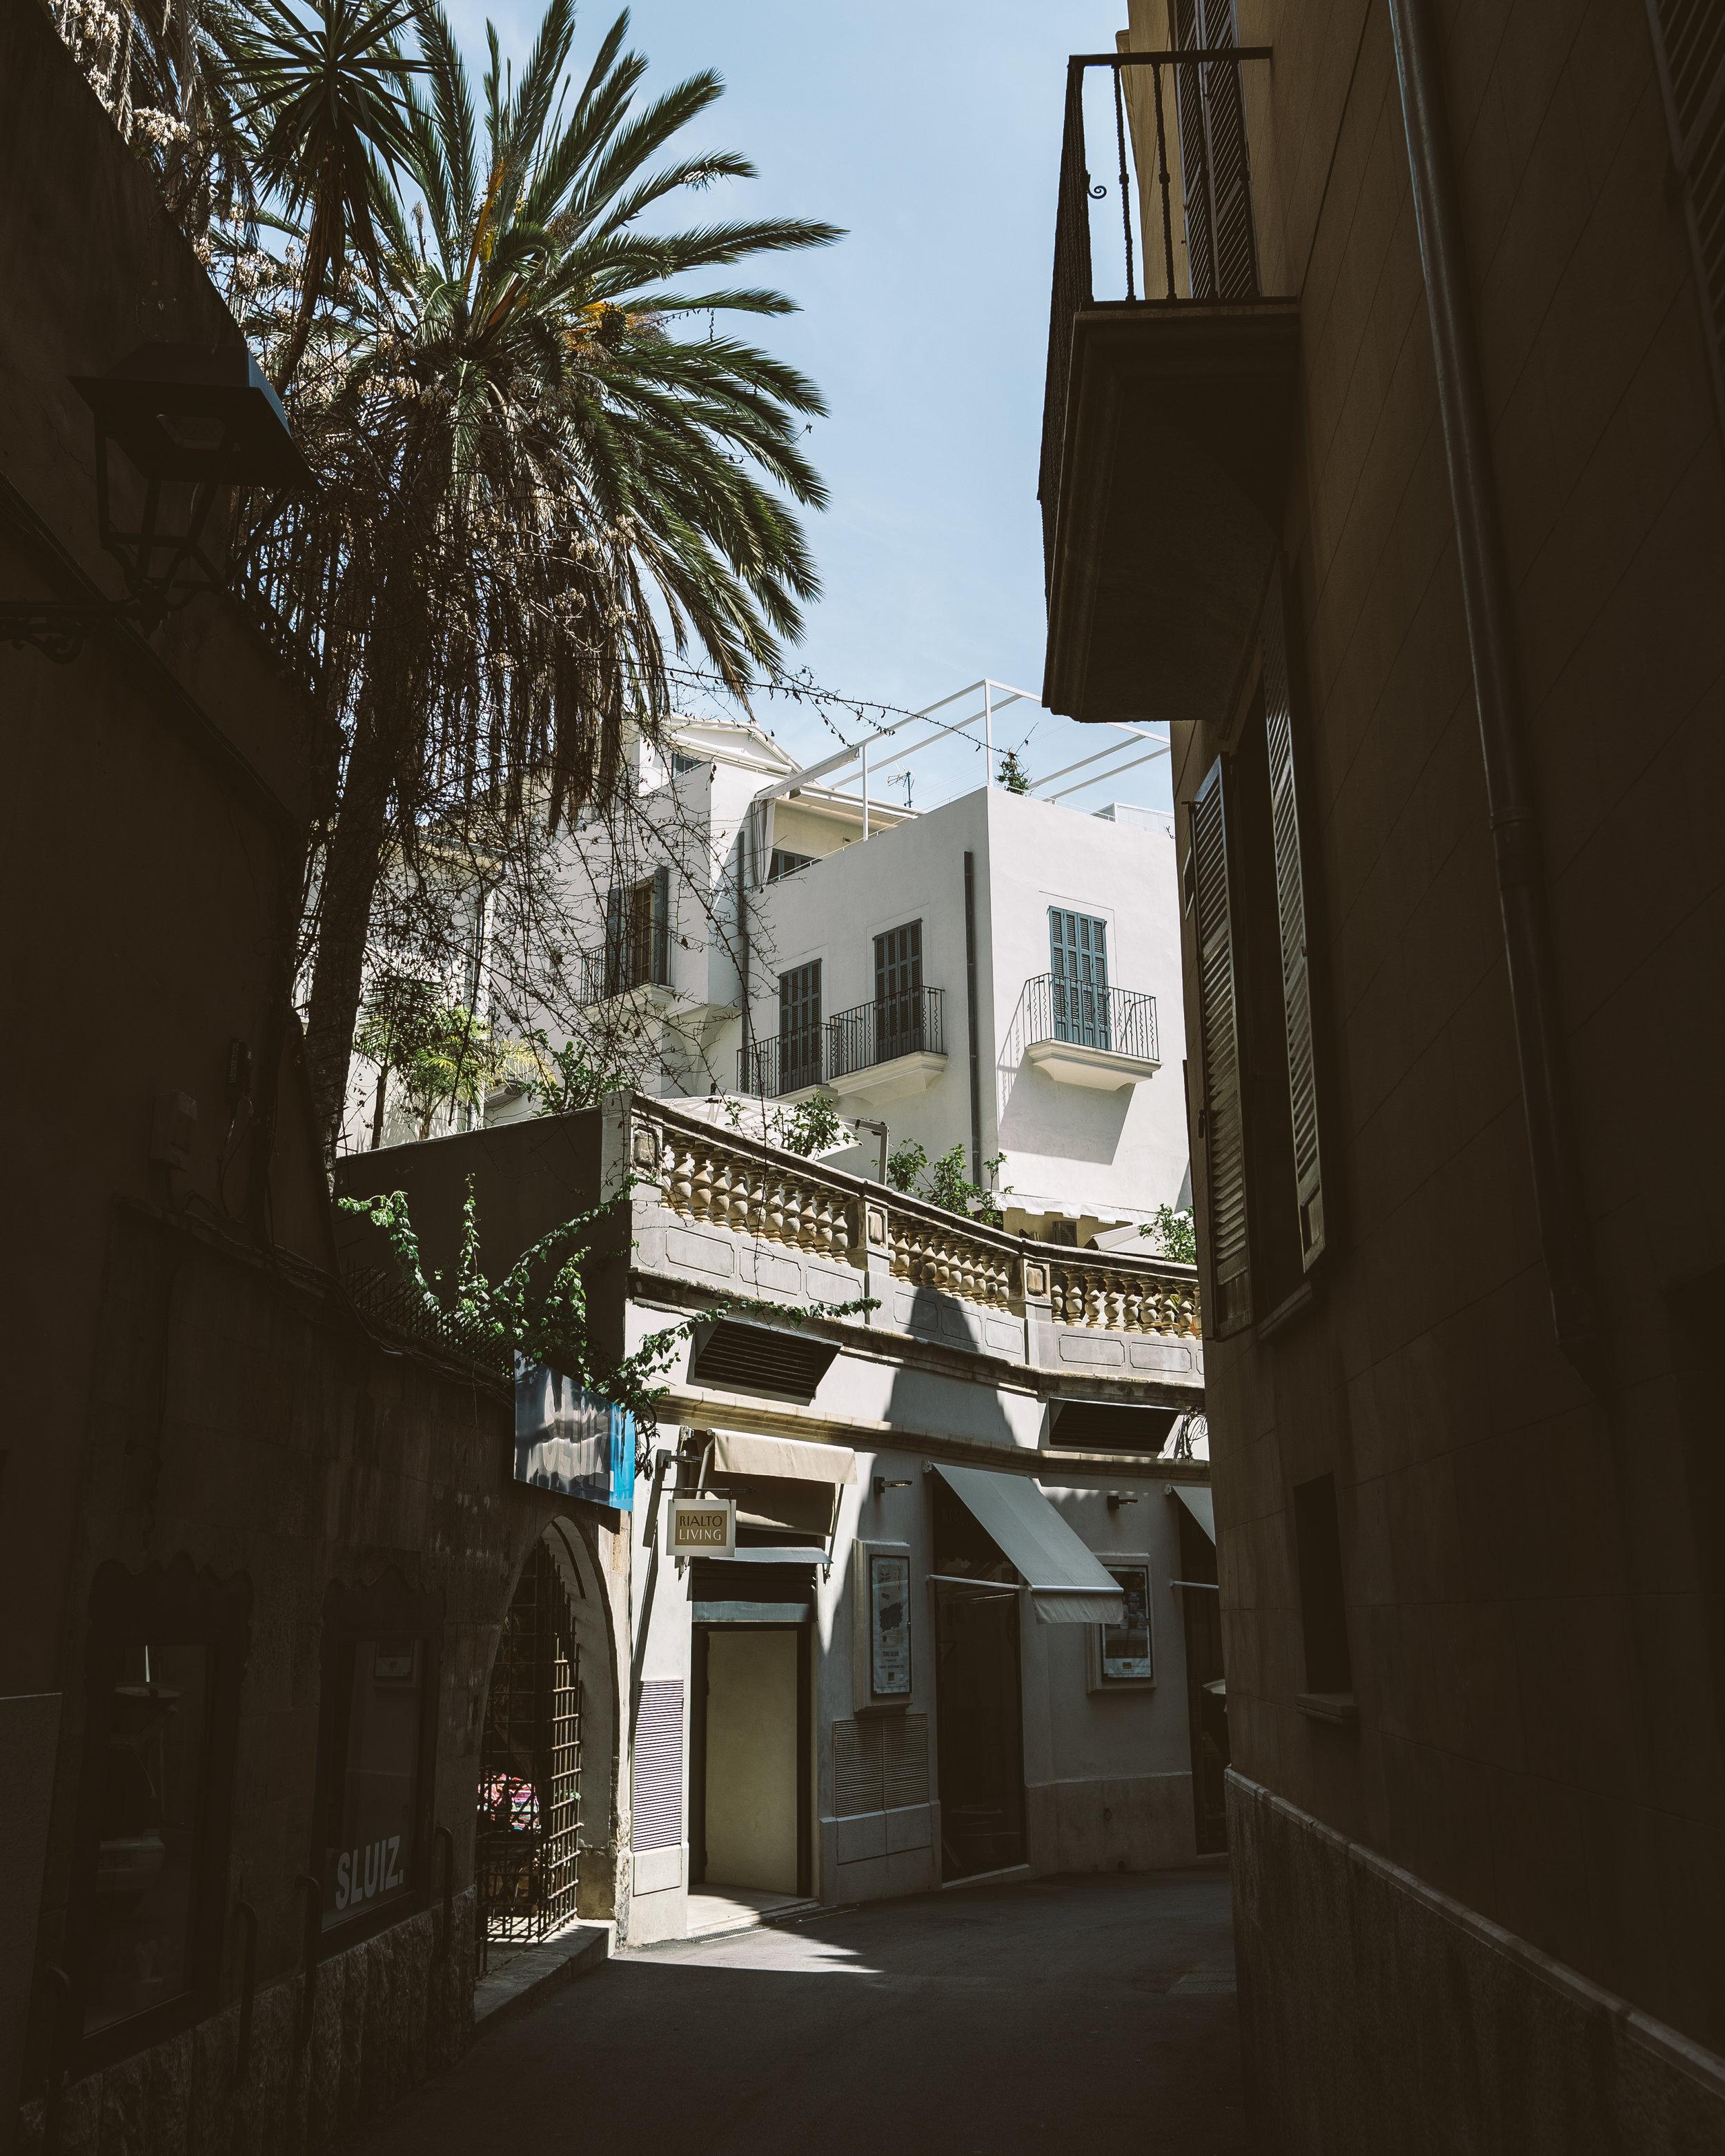 Alley. v2 (1 of 1).jpg